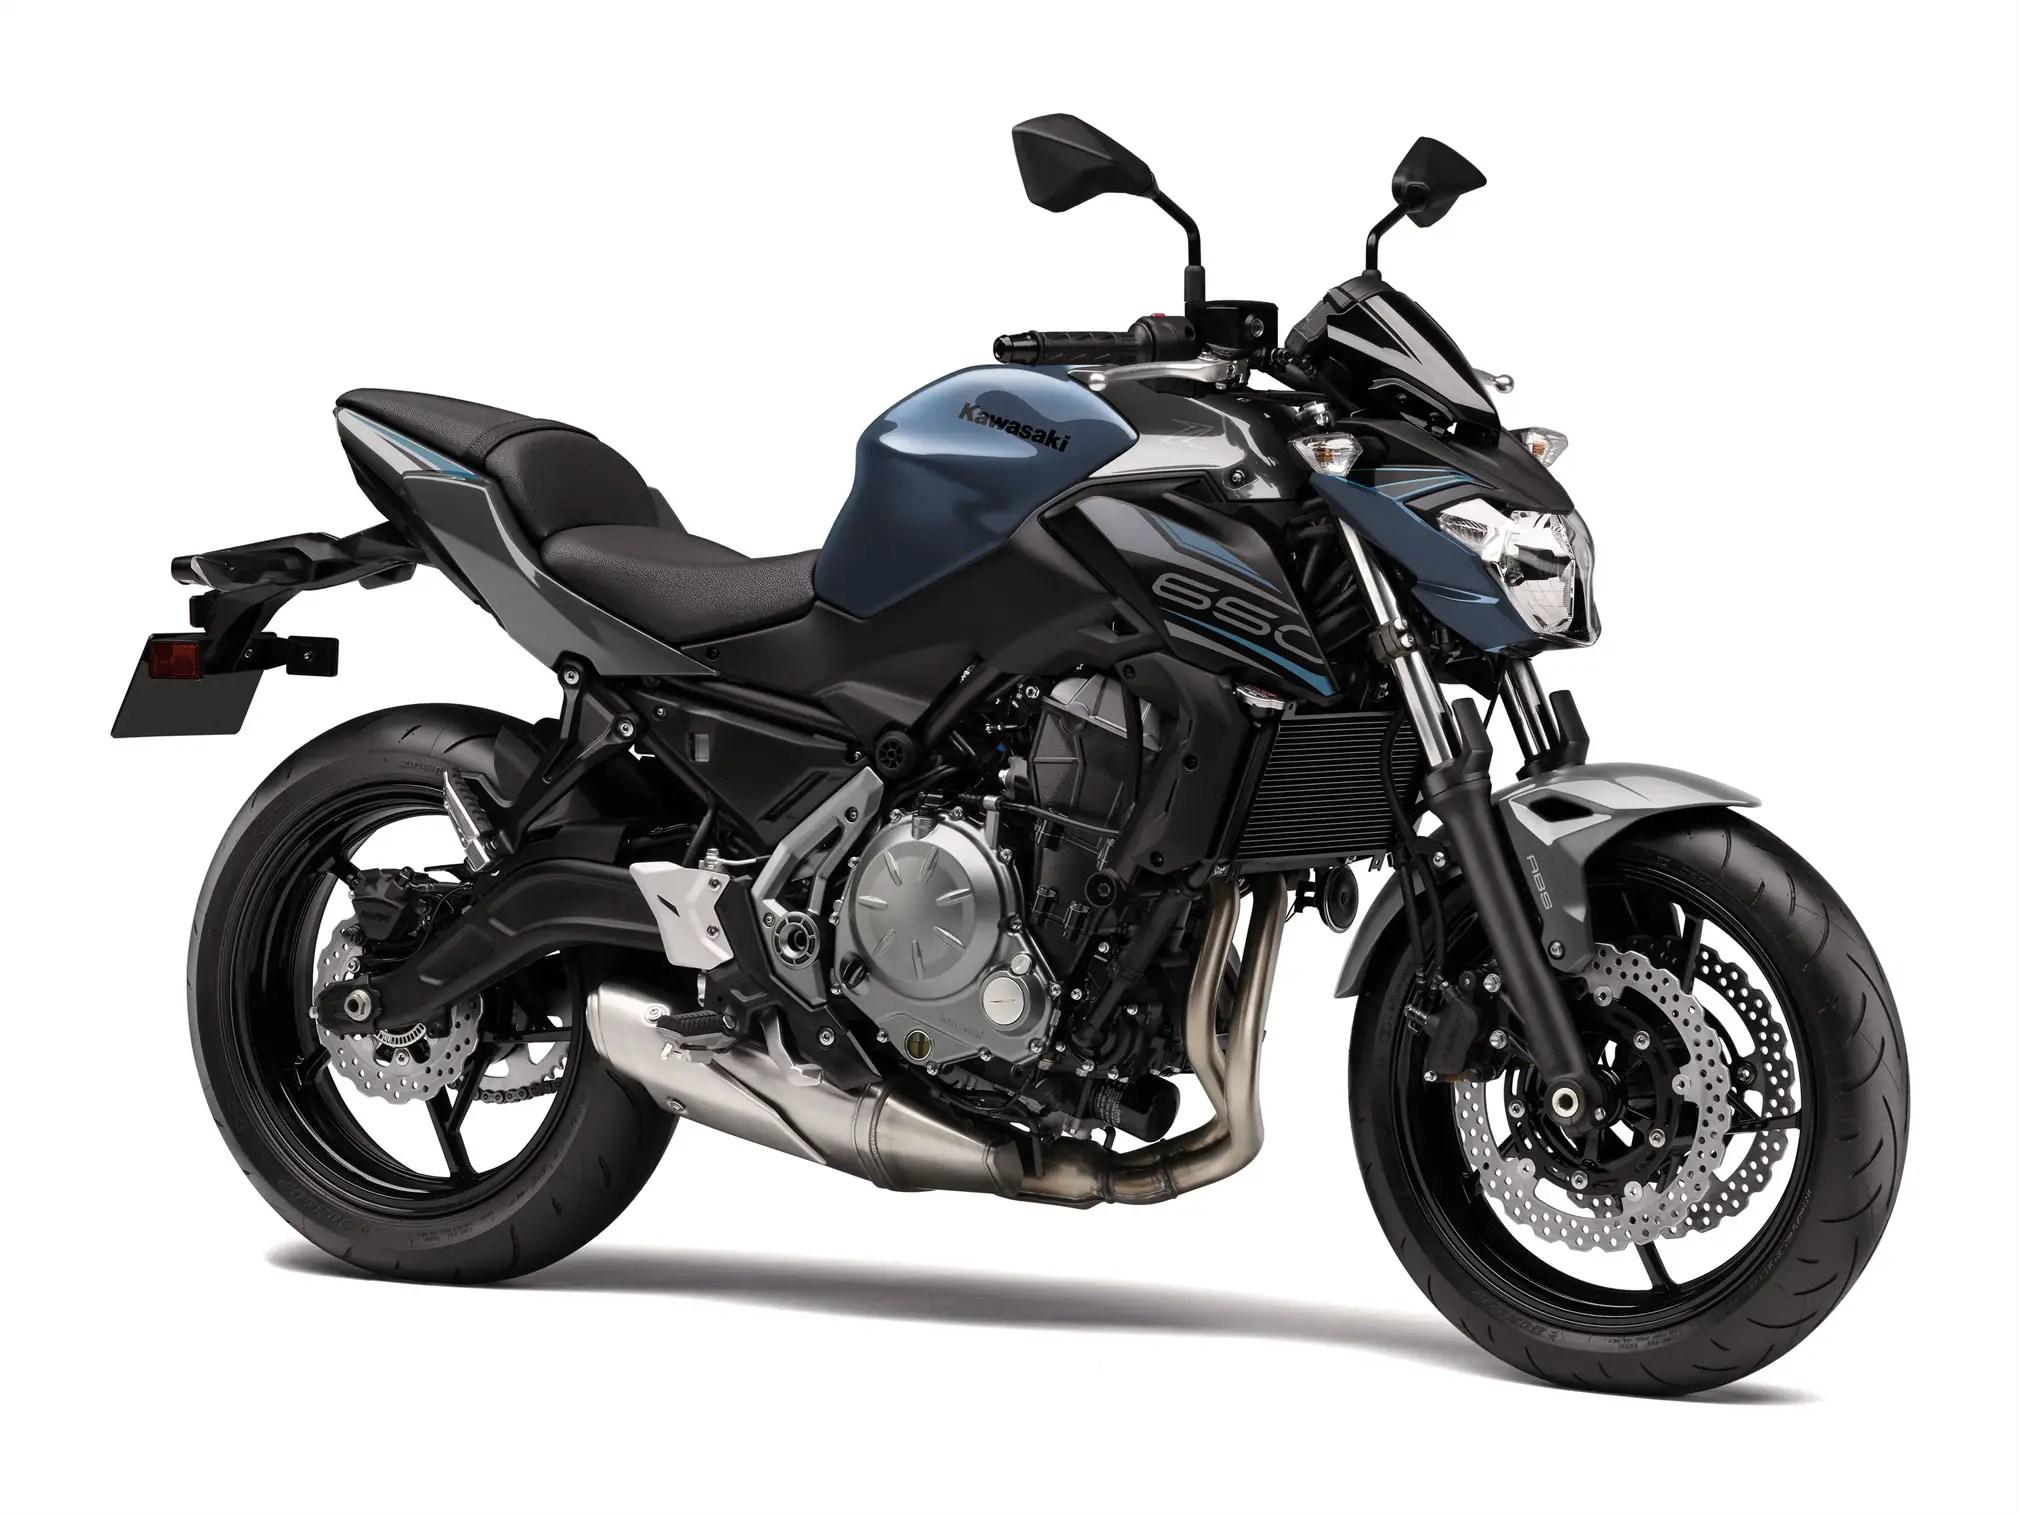 Kawasaki Z650 Abs Guide Total Motorcycle